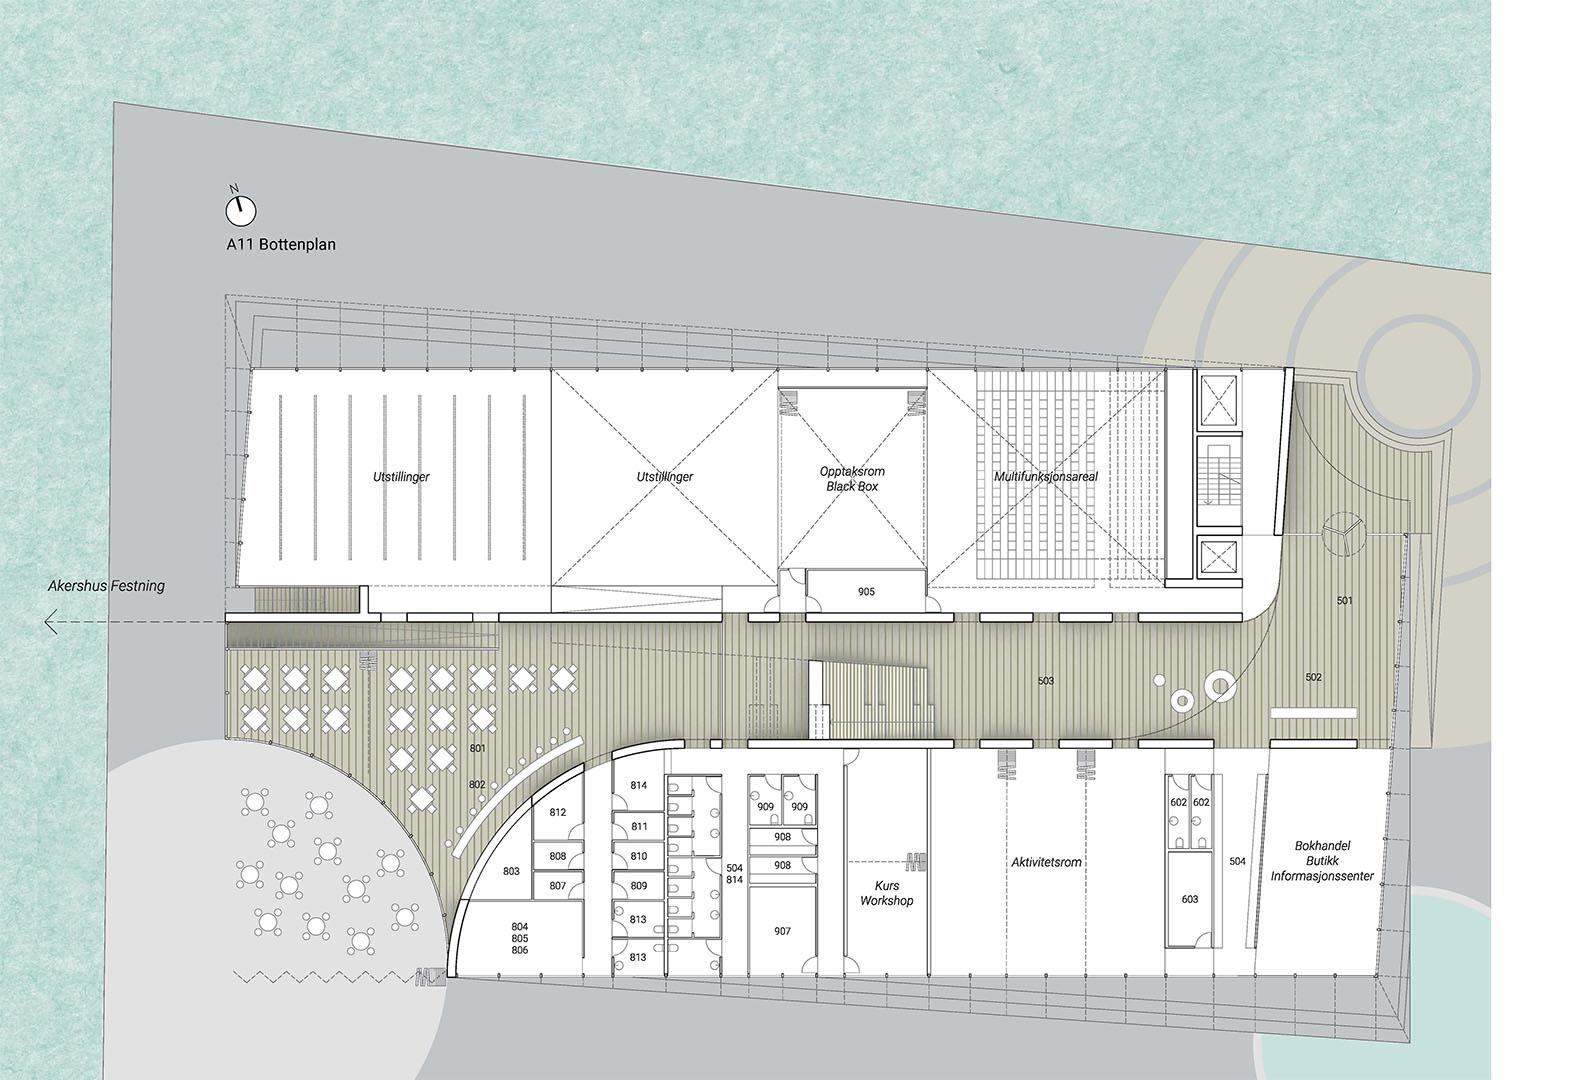 03 PLAYstudio Fotografihuset Oslo Floor Plan